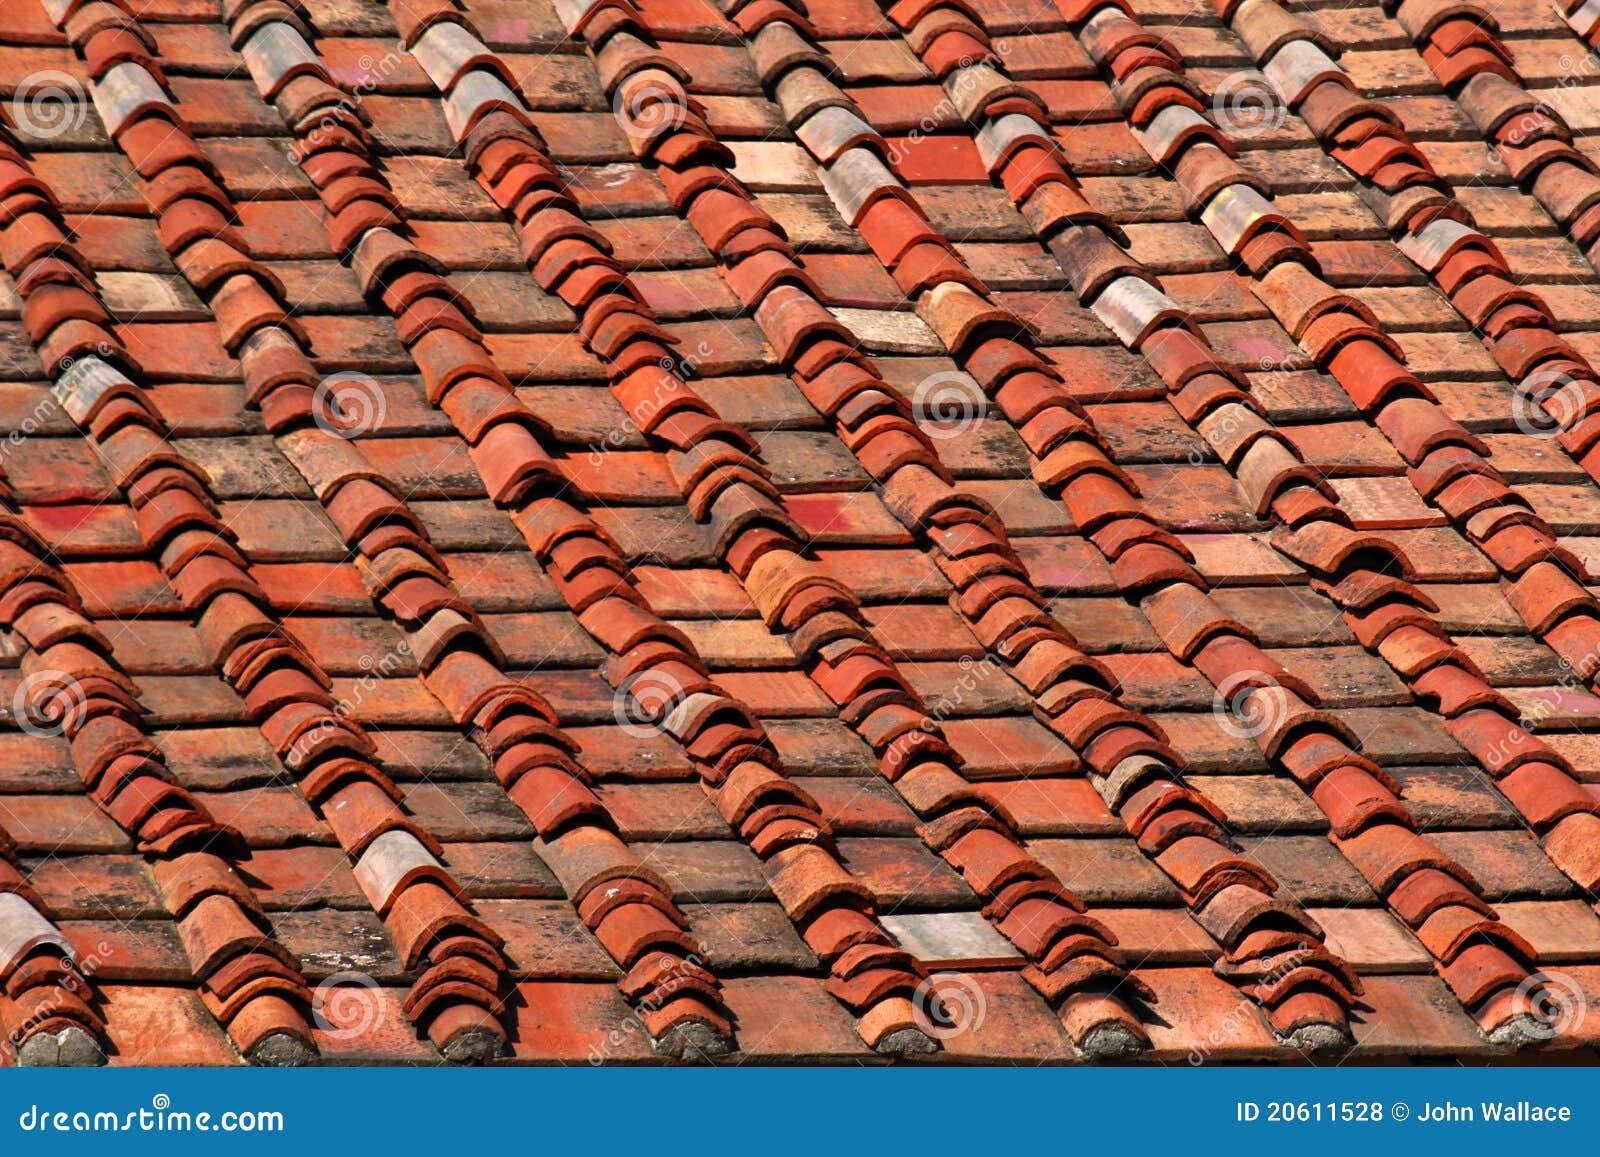 Image Result For Terracotta Roof